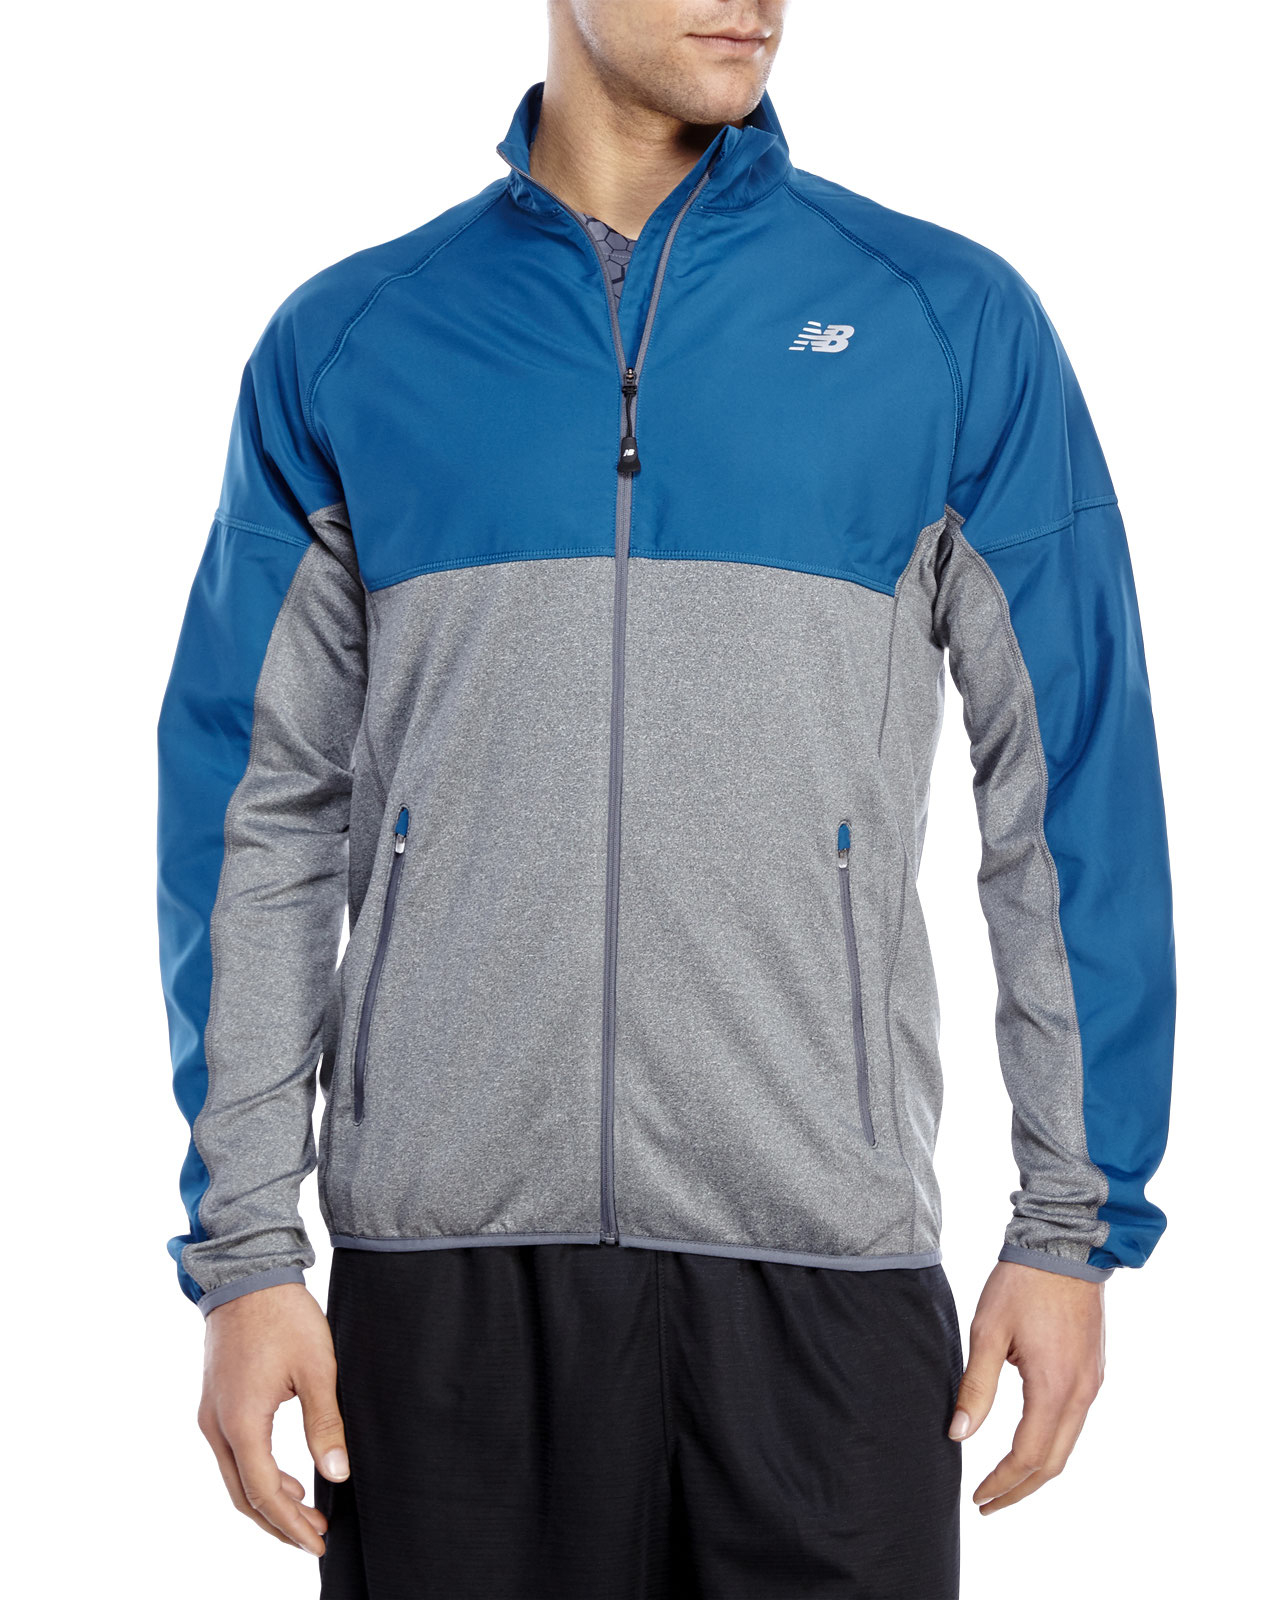 f74c6249441df New Balance Raptor Jacket in Blue for Men - Lyst